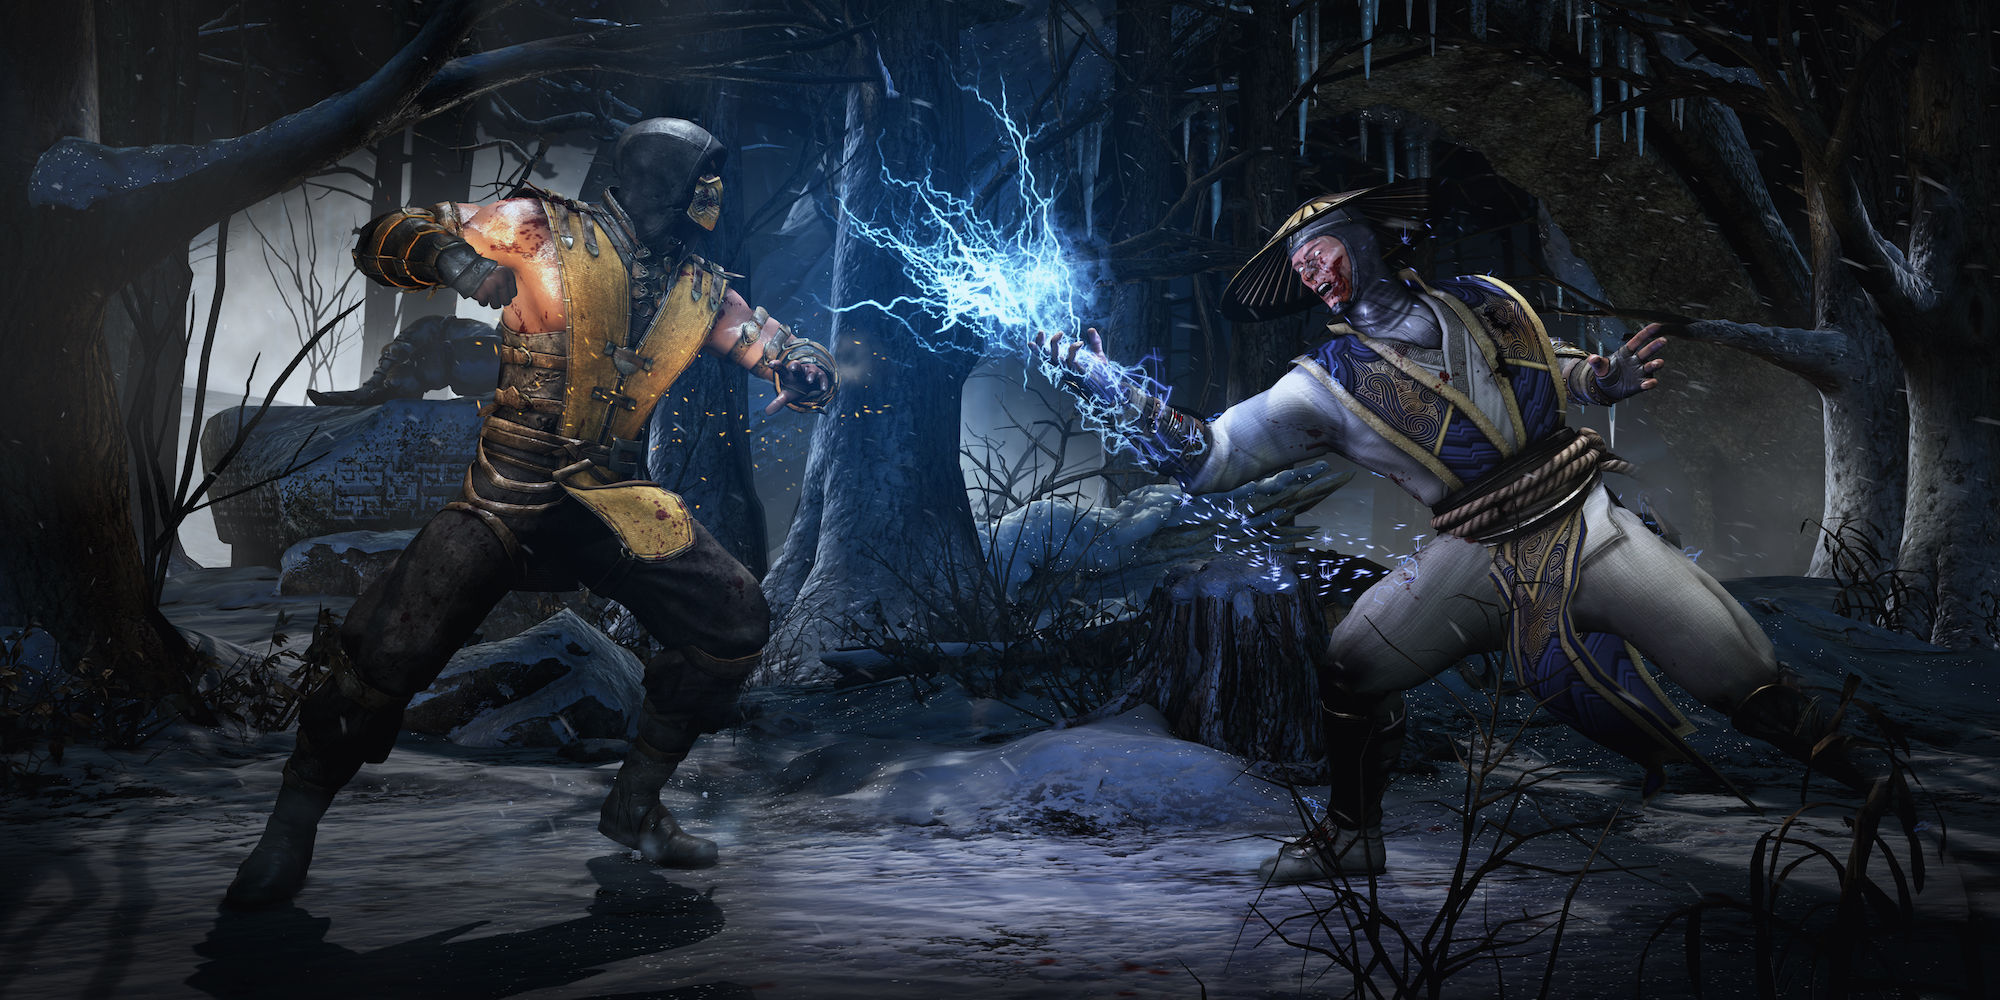 James Wan Says New Mortal Kombat Movie Won't Be Rushed